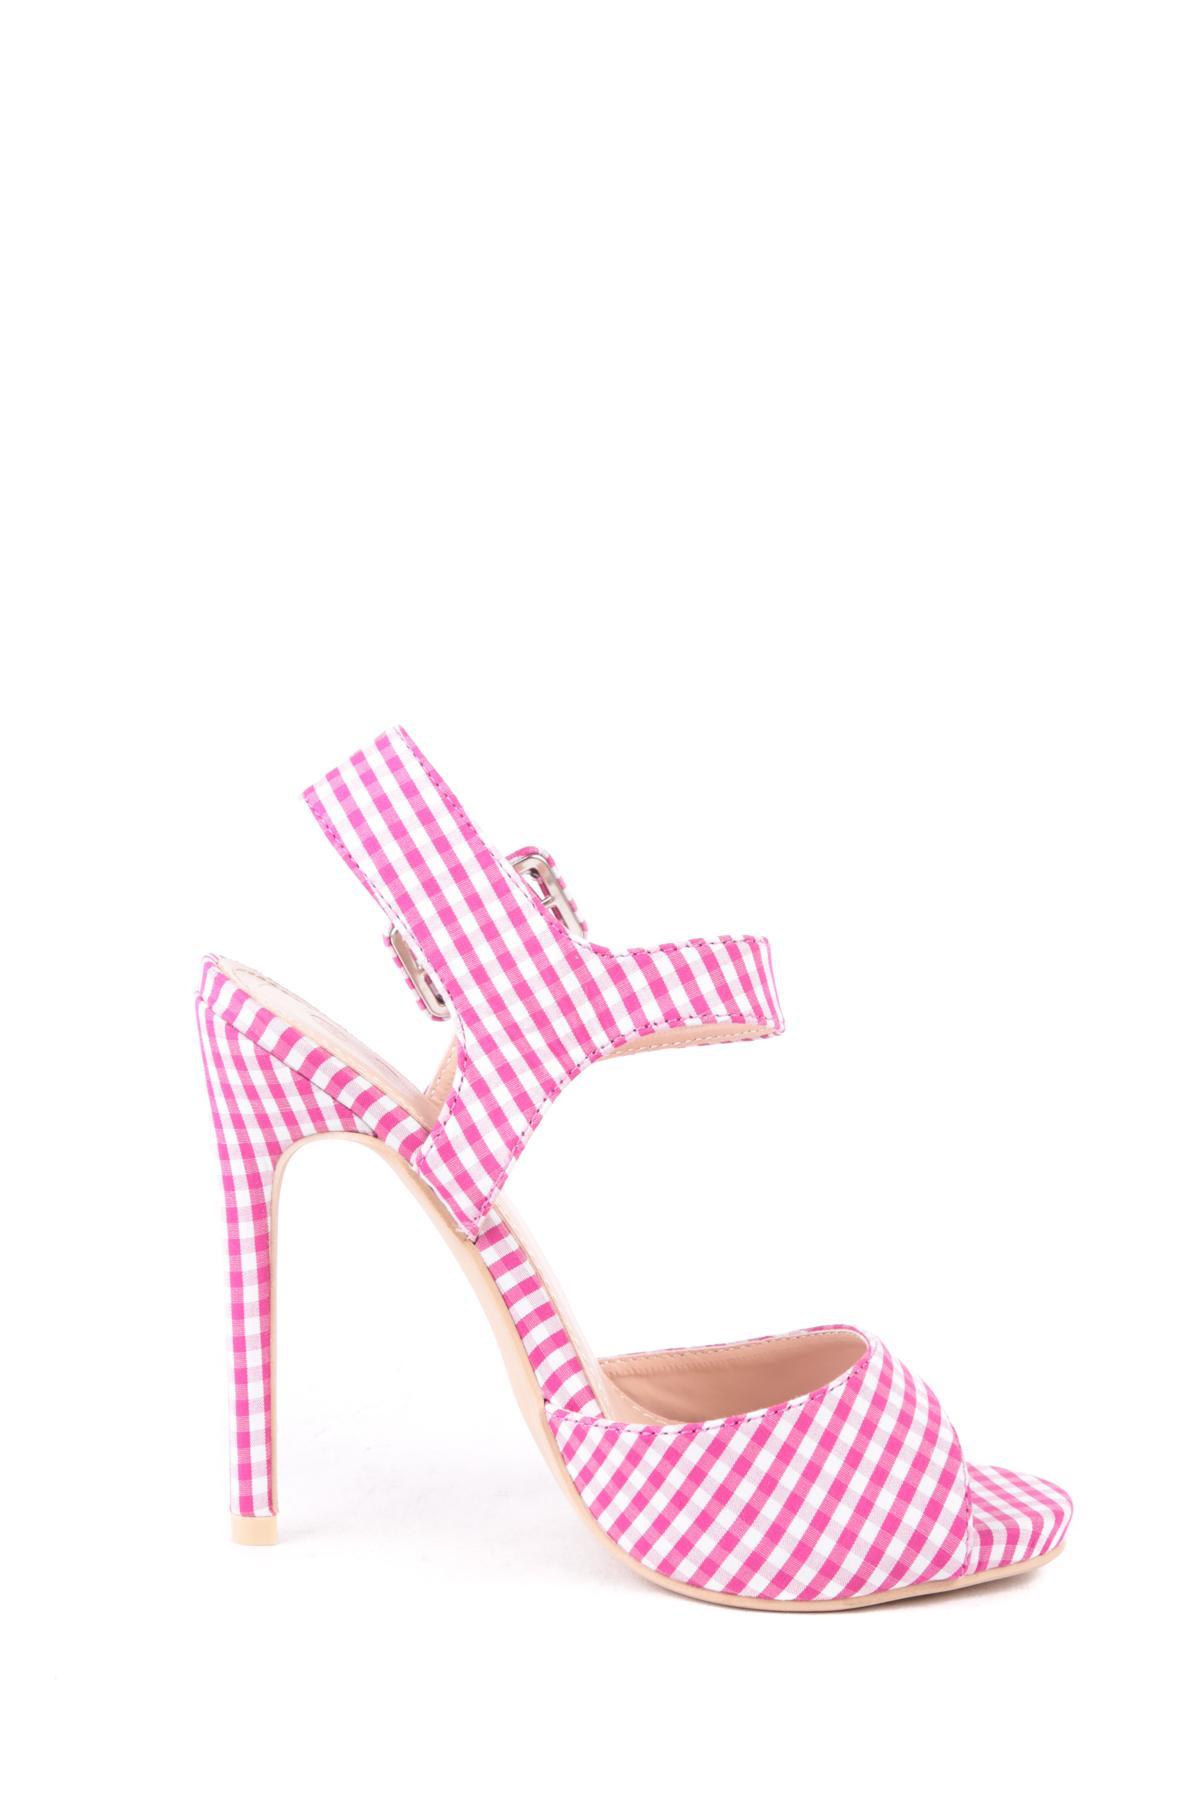 Escarpins Chaussures Fushia WILEDI 708-15 #c eFashion Paris